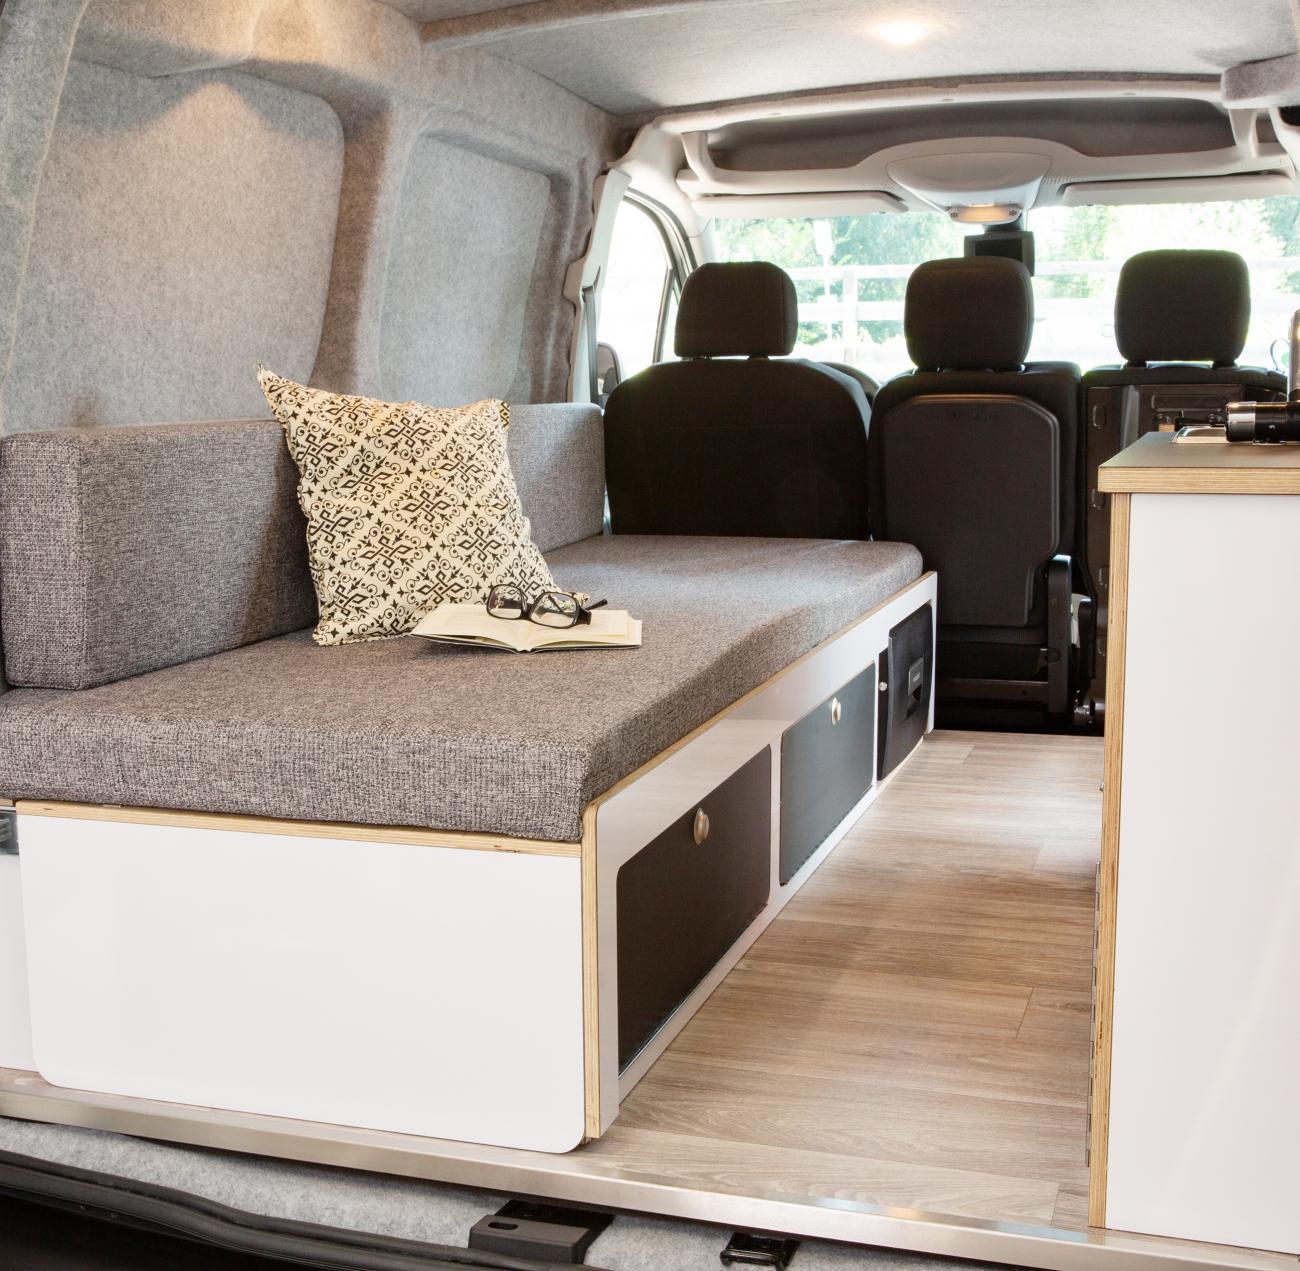 Full Size of Platzsparend In Den Urlaub Peugeot Partner Alpin Camper Welt Französische Betten Clinique Even Better Bett 220 X 200 Ausziehbares Bestes 140x200 Mit Stauraum Bett Bett Platzsparend